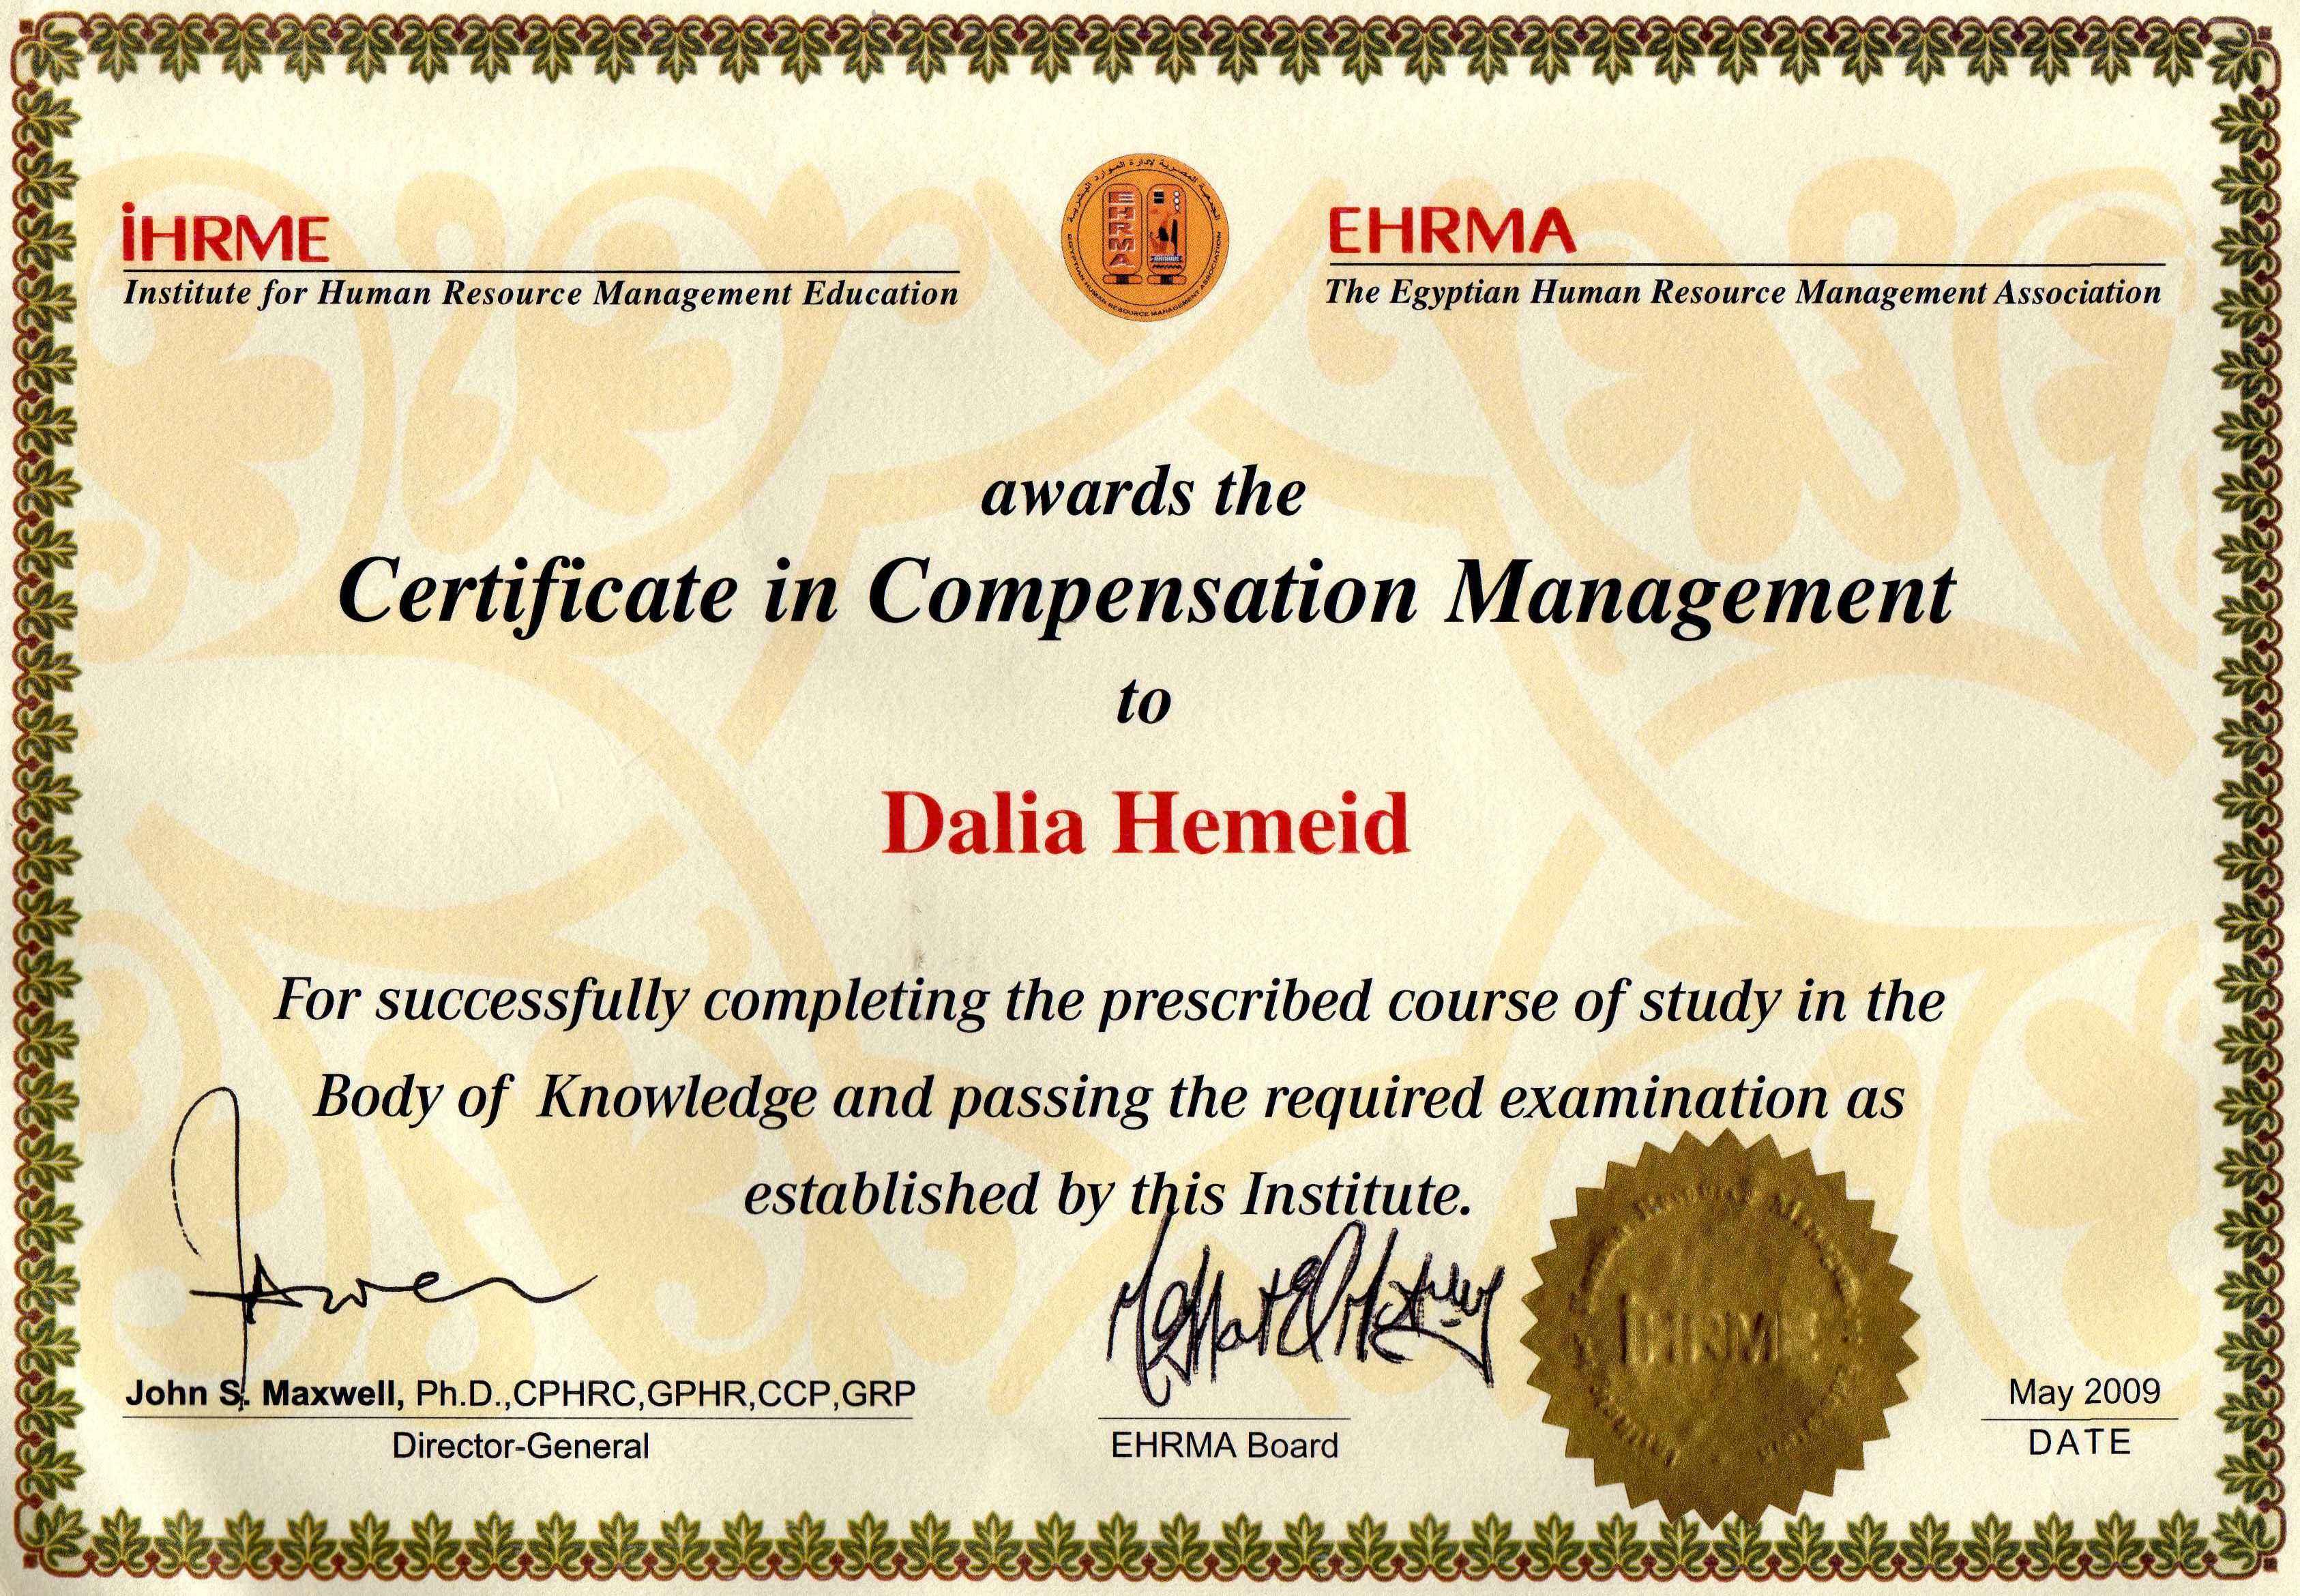 Dalia hemeid bayt certificate in compensation management certificate xflitez Images